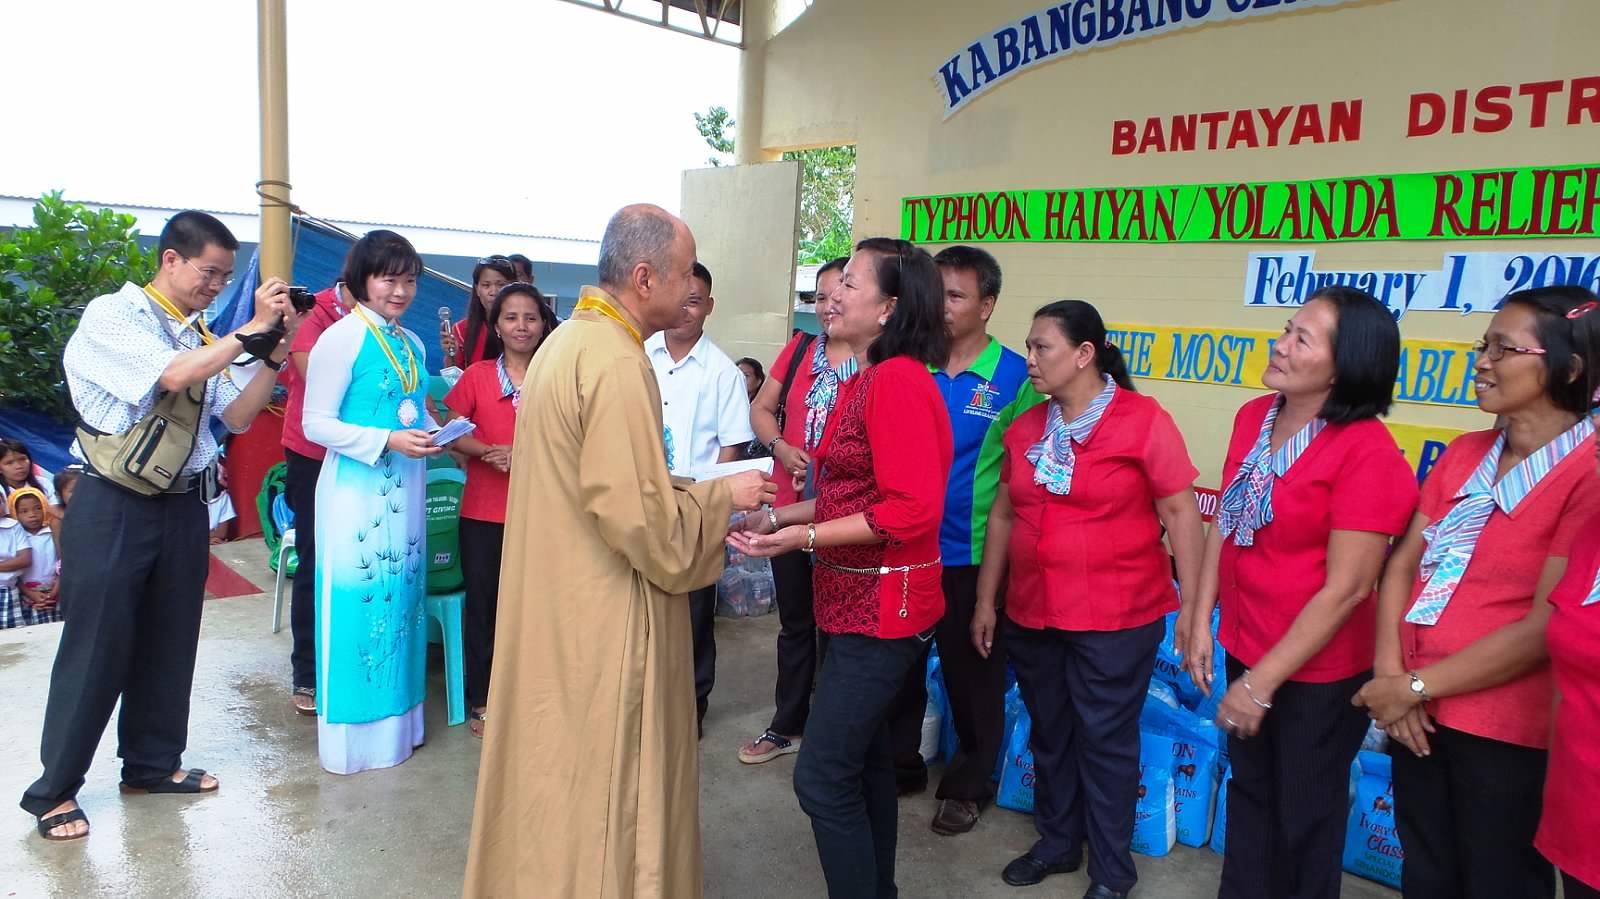 14 Bantayan Feb 1 to 2, 2016 (61)